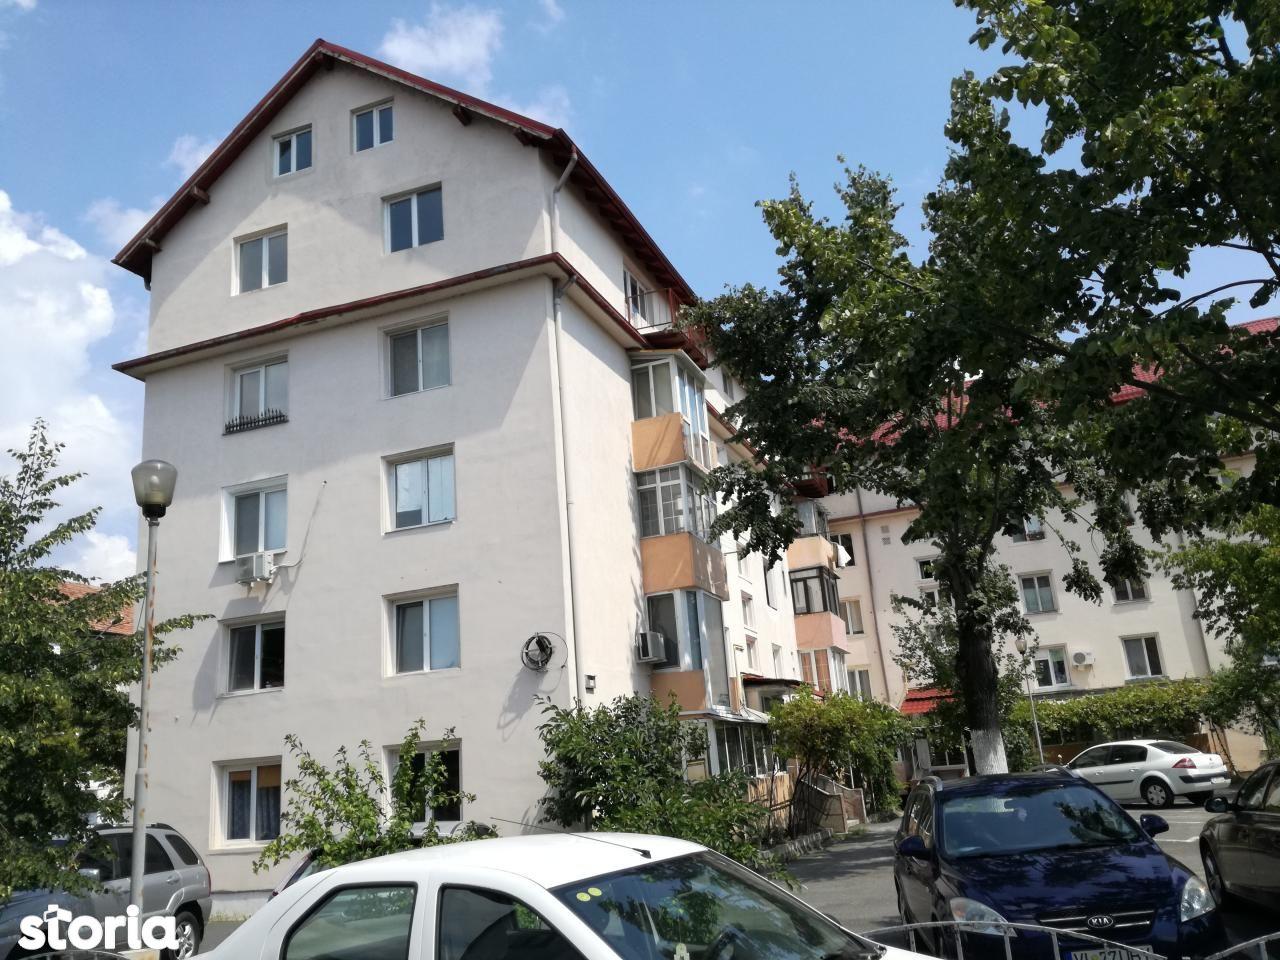 apartament 4 camere centru (T.Vladimirescu)